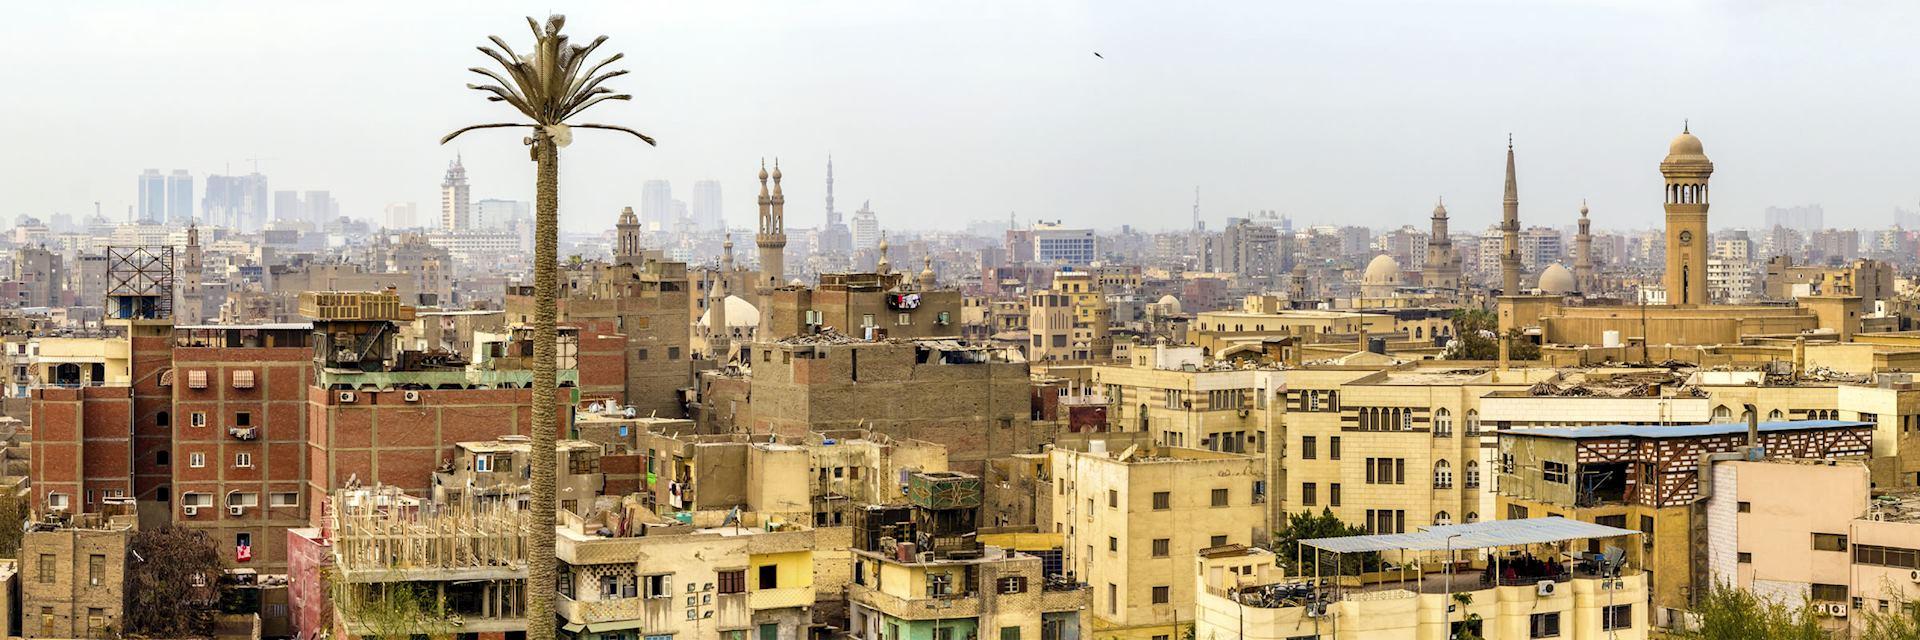 Cairo in Egypt